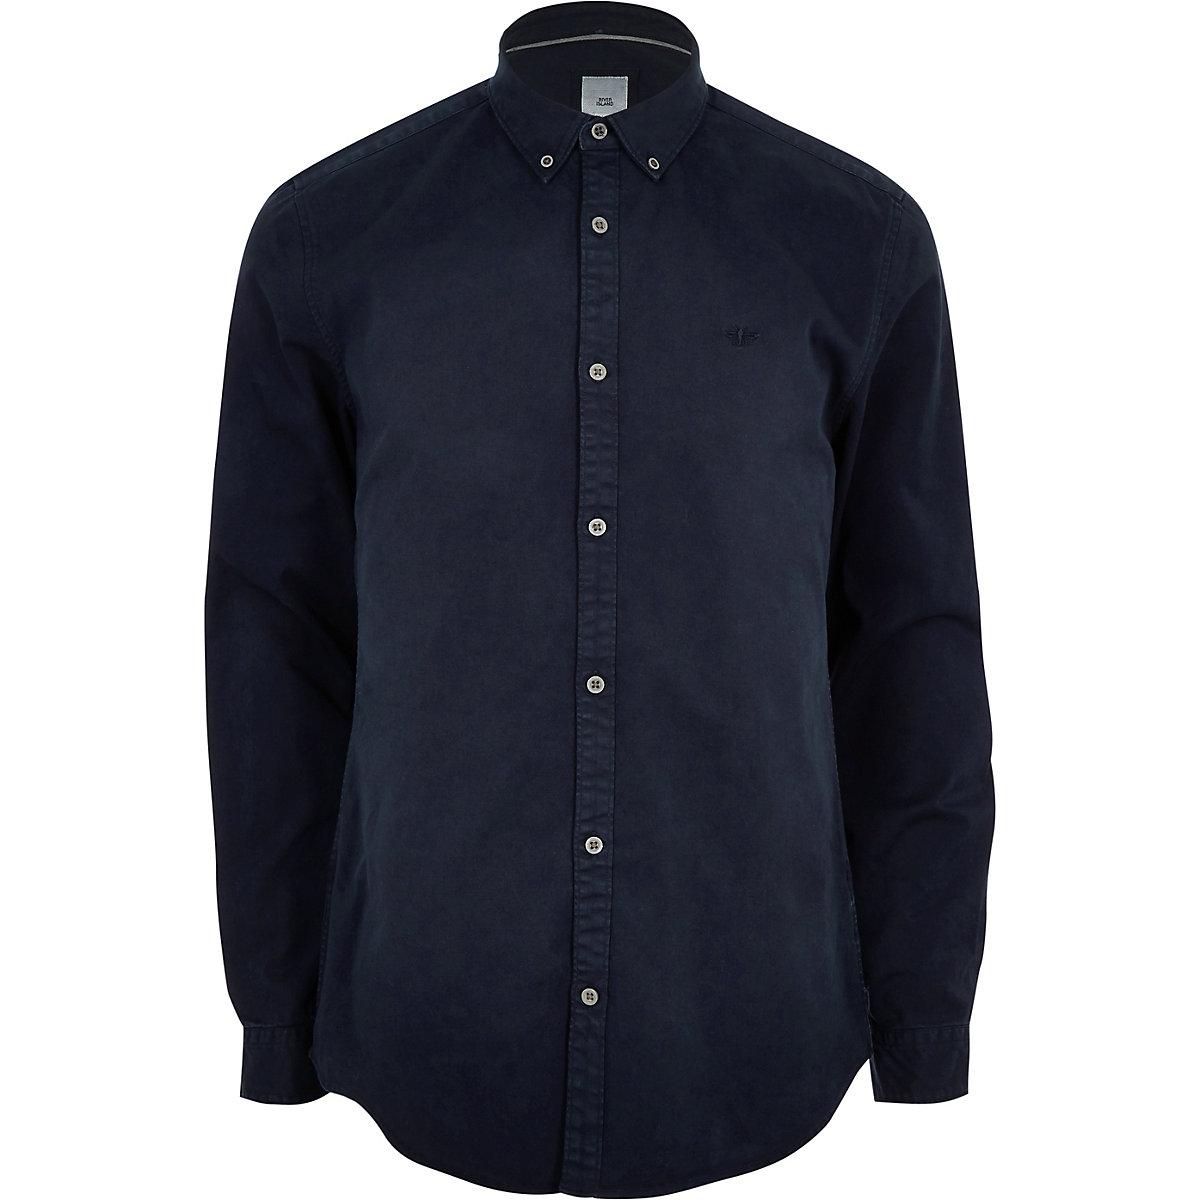 Navy button down stretch long sleeve shirt